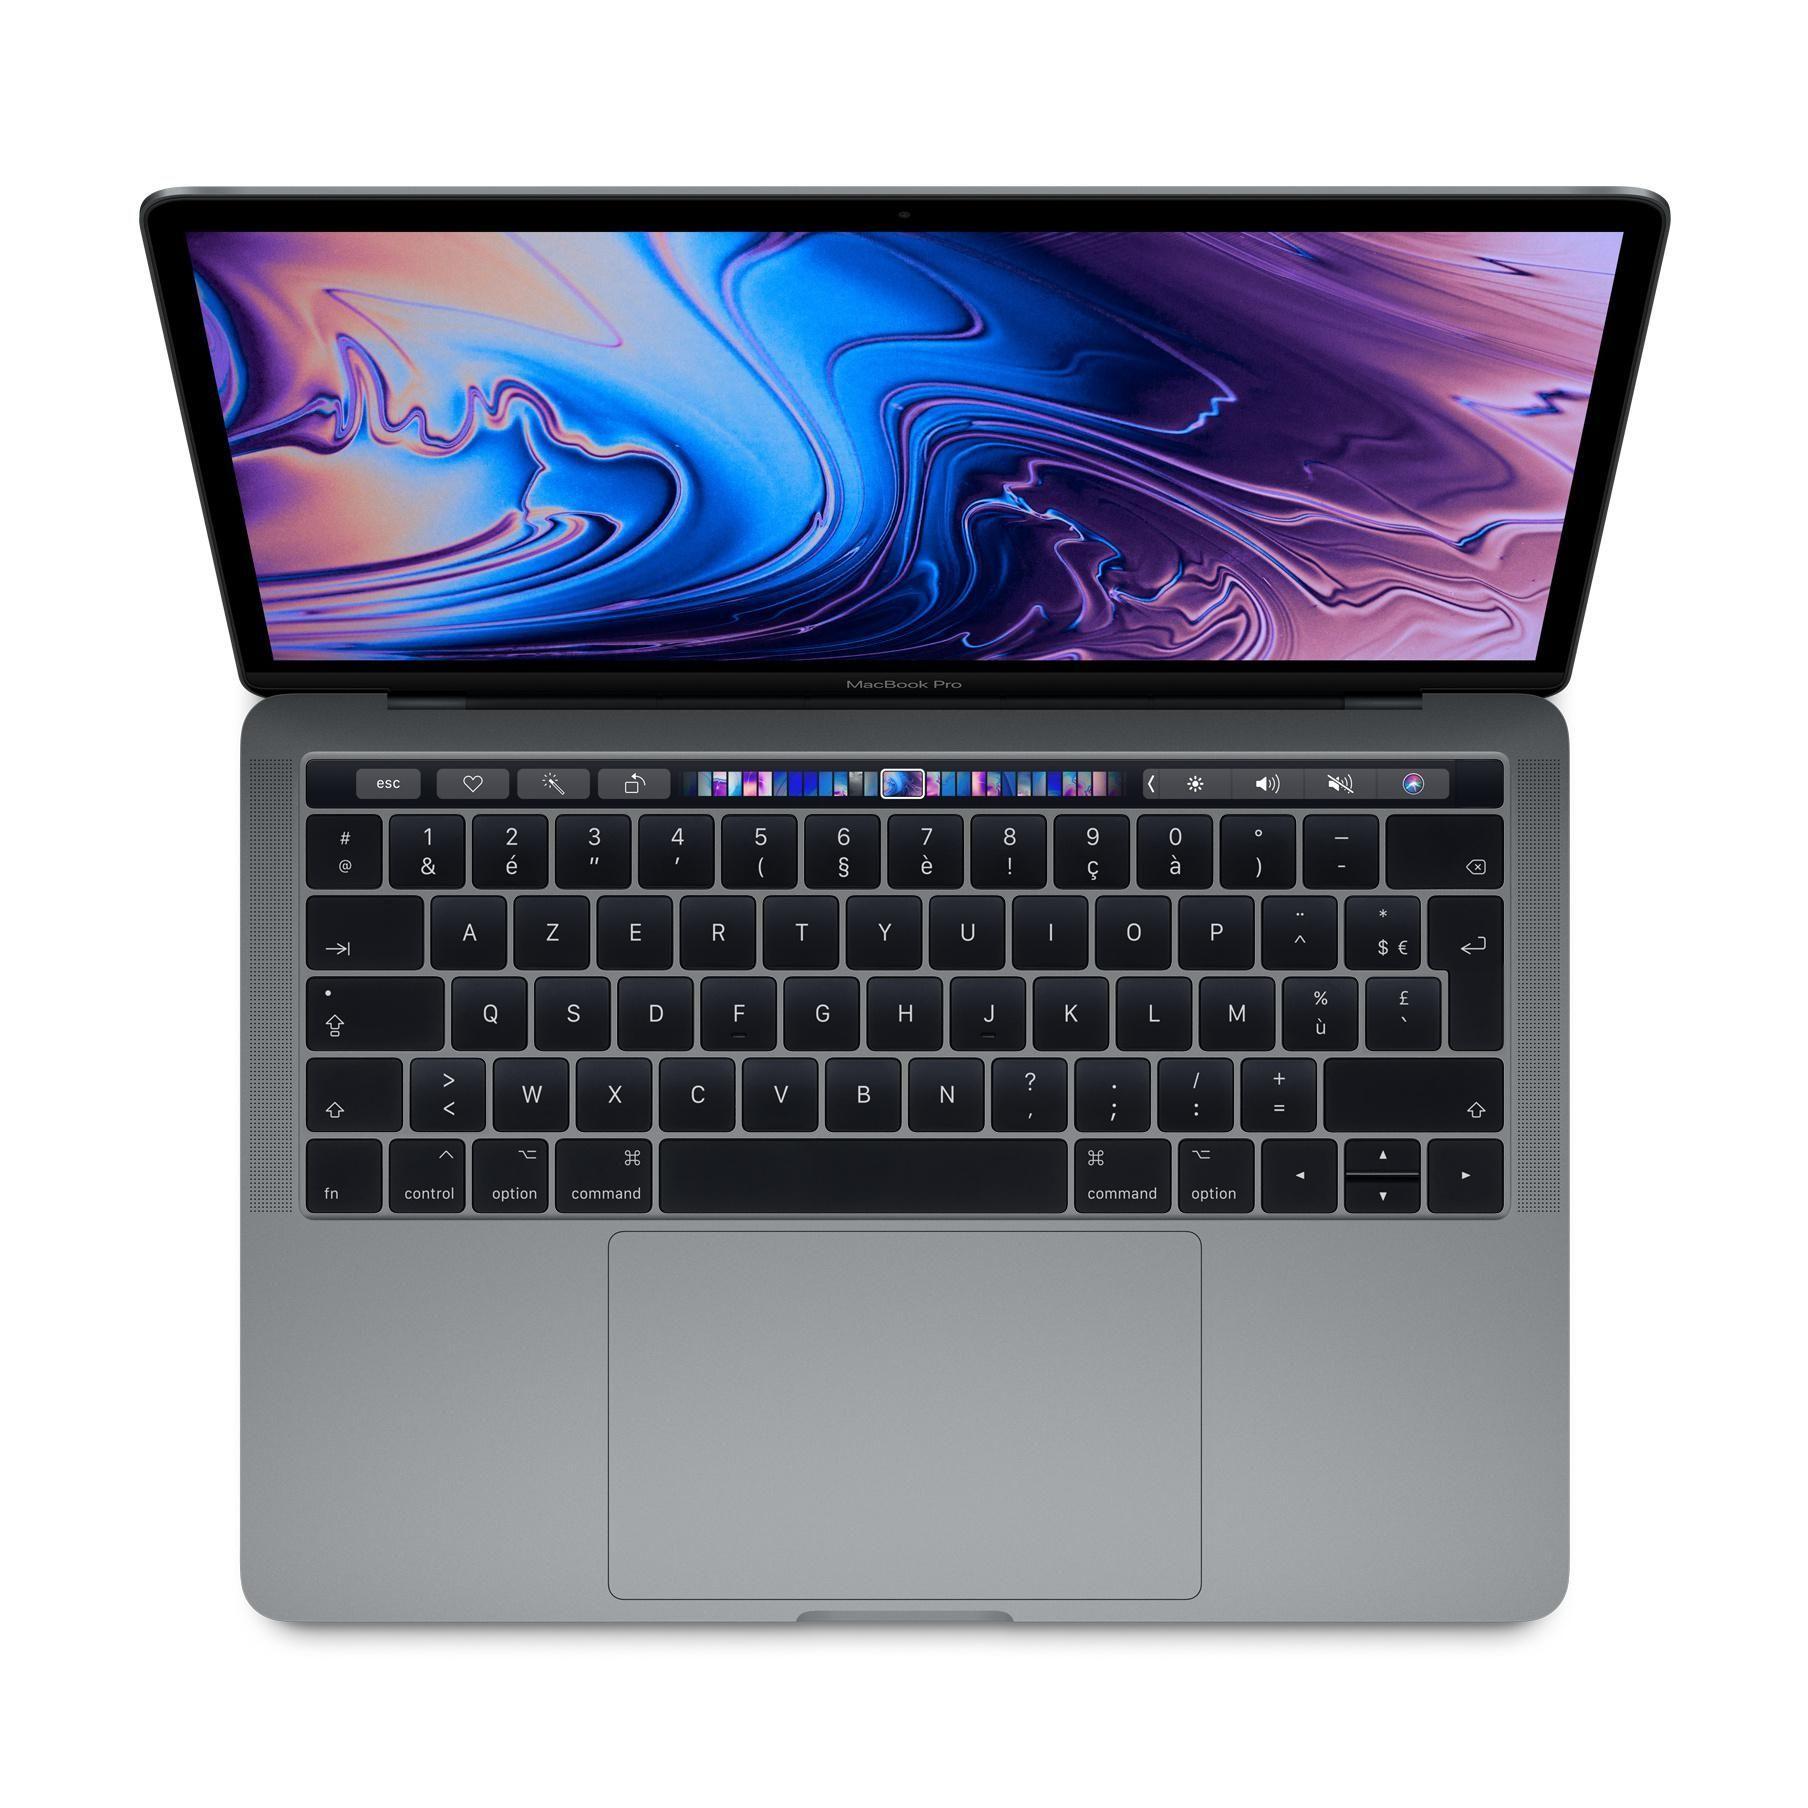 Apple Laptop 15 6 Inches Full Hd Ips Display Amd Ryzen 3 3200u Vega 3 Graphics 4gb In 2020 Apple Macbook Pro Macbook Pro Retina Apple Macbook